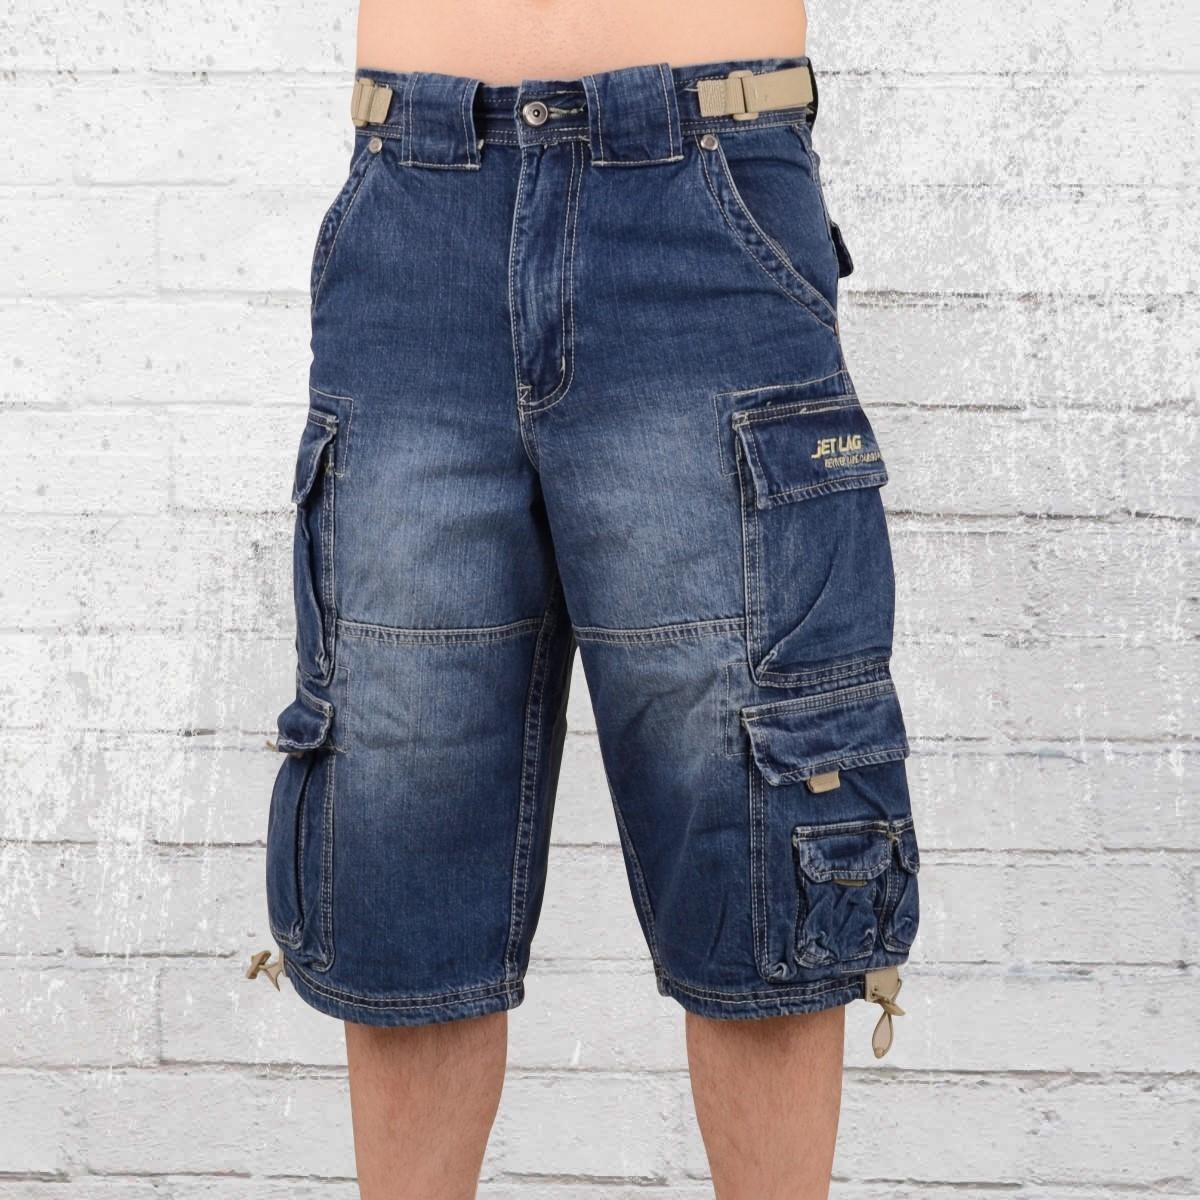 jetzt bestellen jet lag m228nner jeans short 007 b